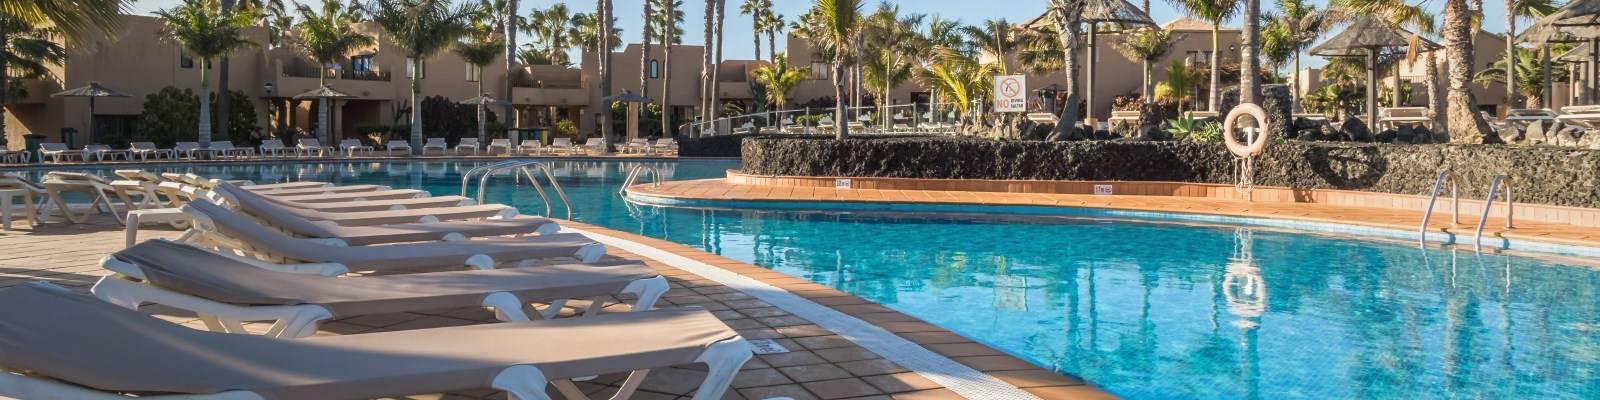 Hotel en Corralejo, Fuerteventura | Oasis Duna